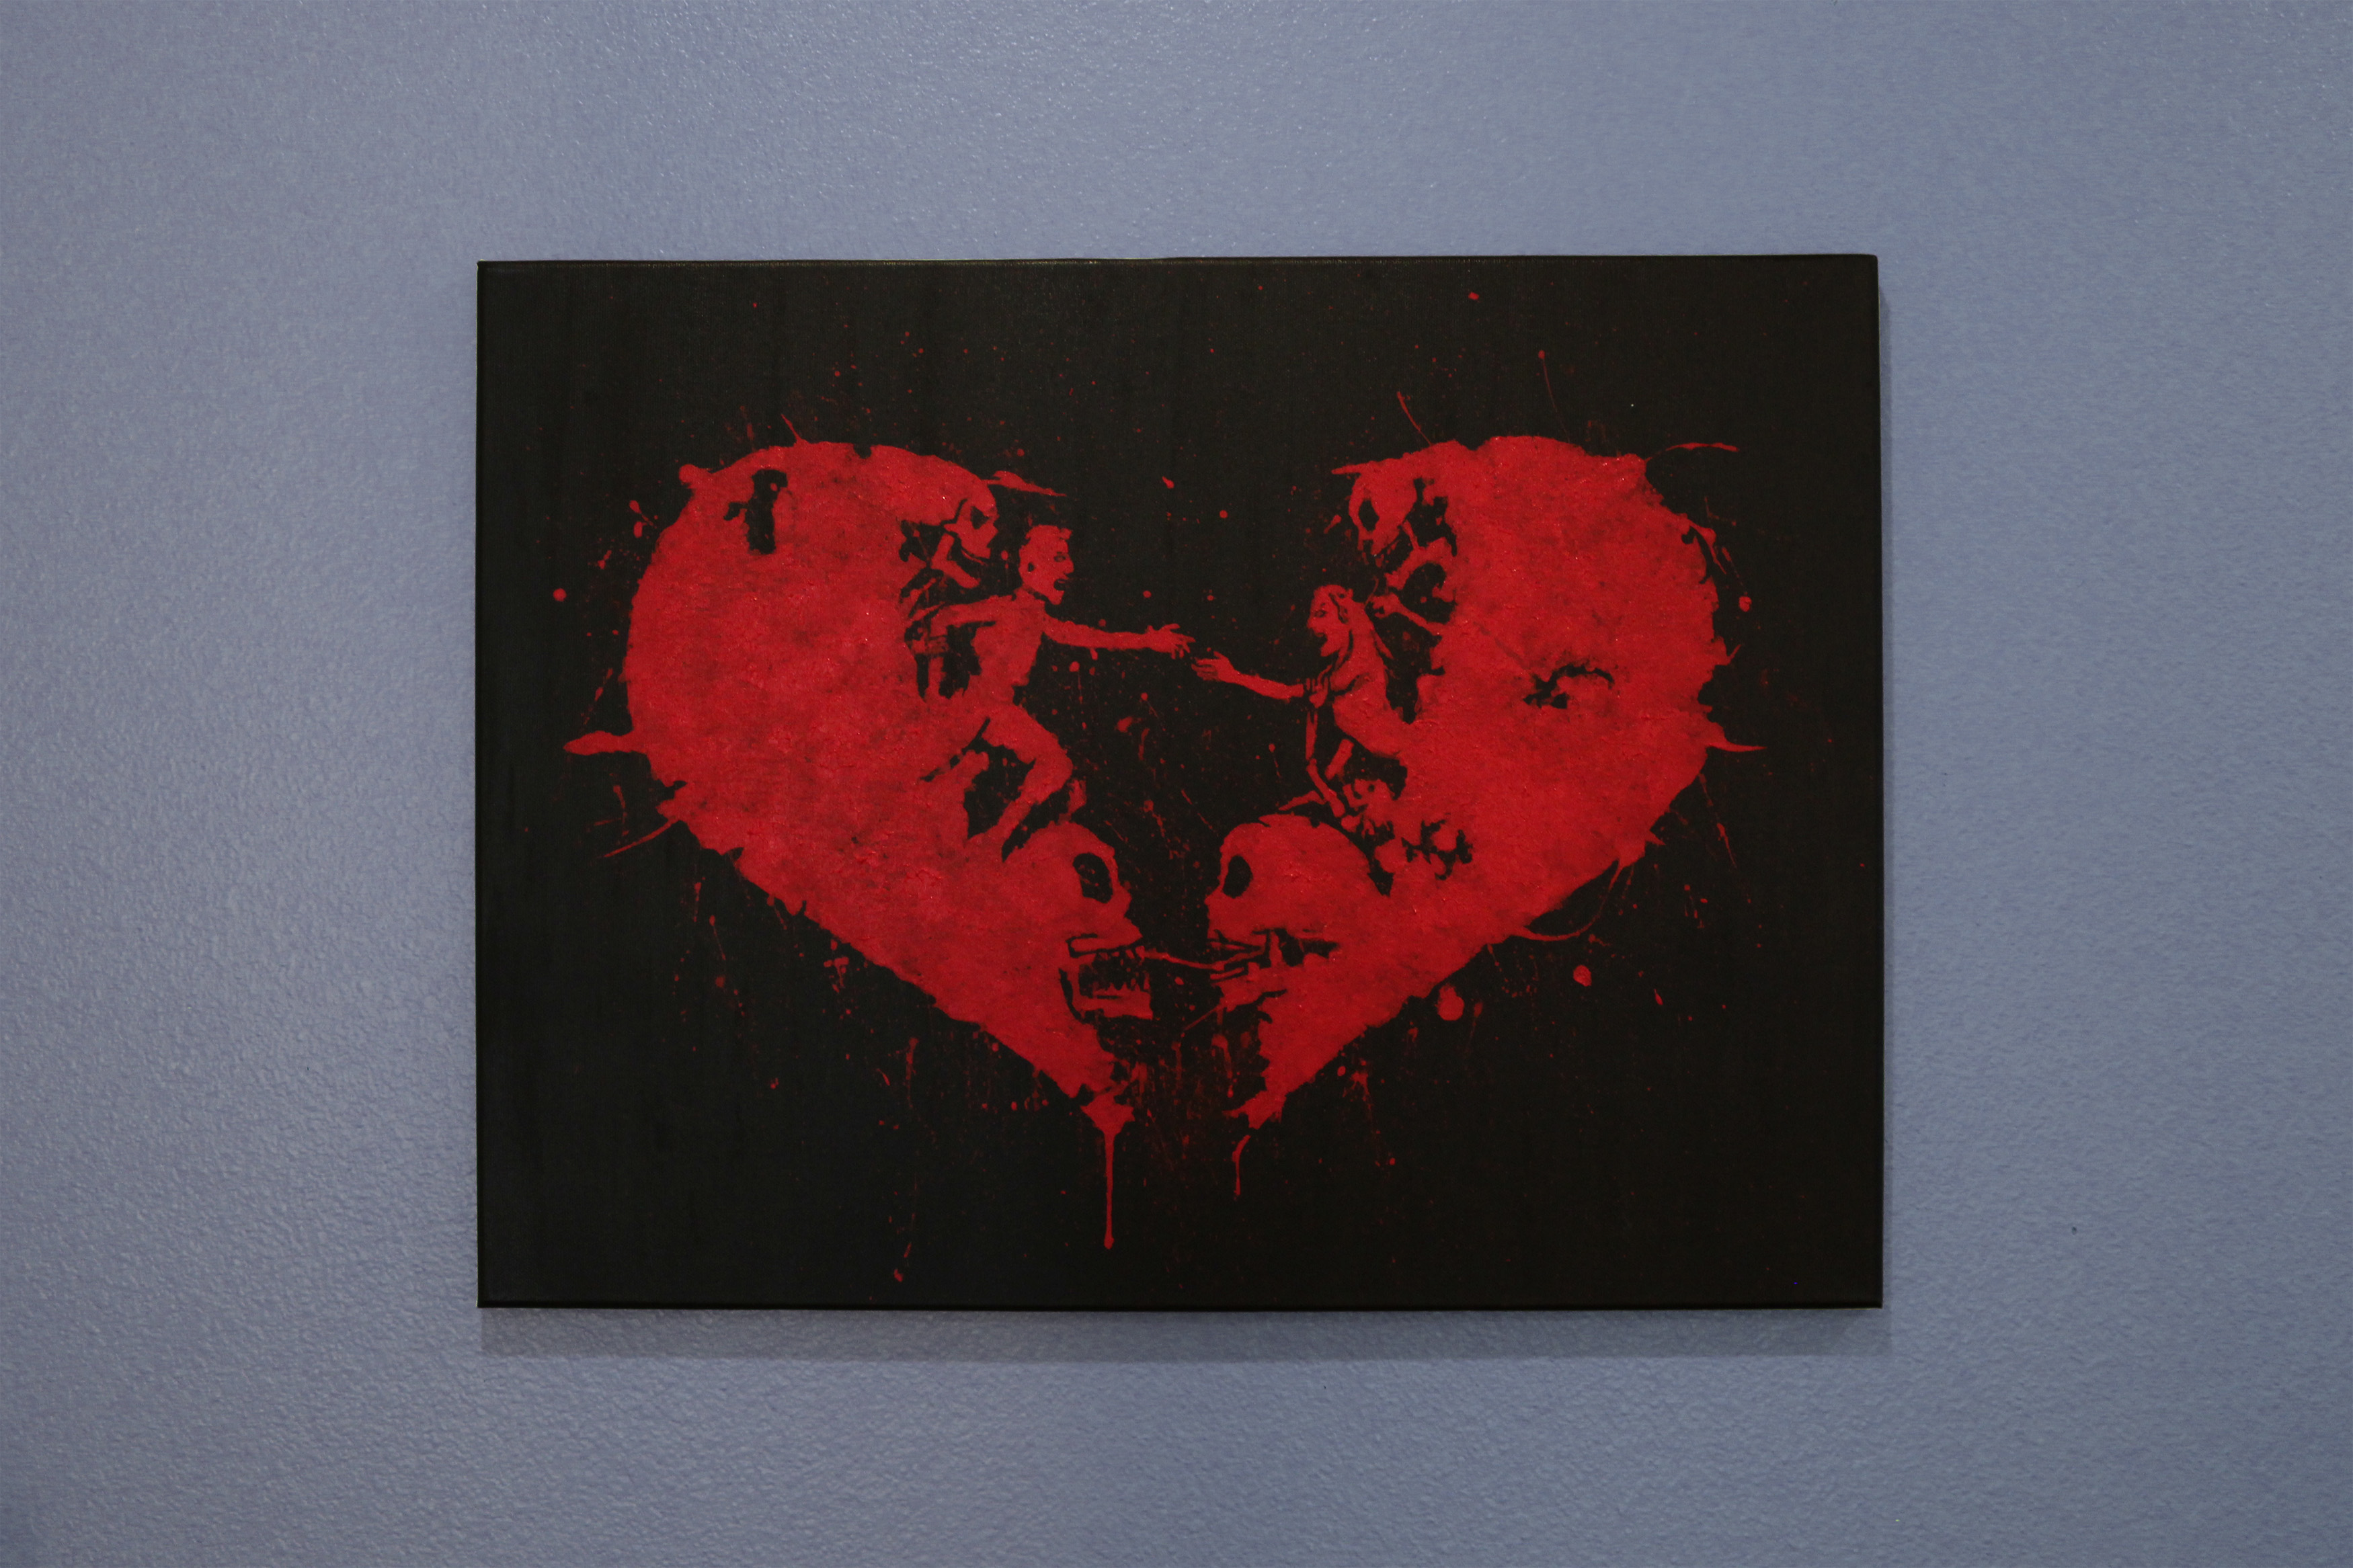 Bleeding heart acrylic painting 24 x 18